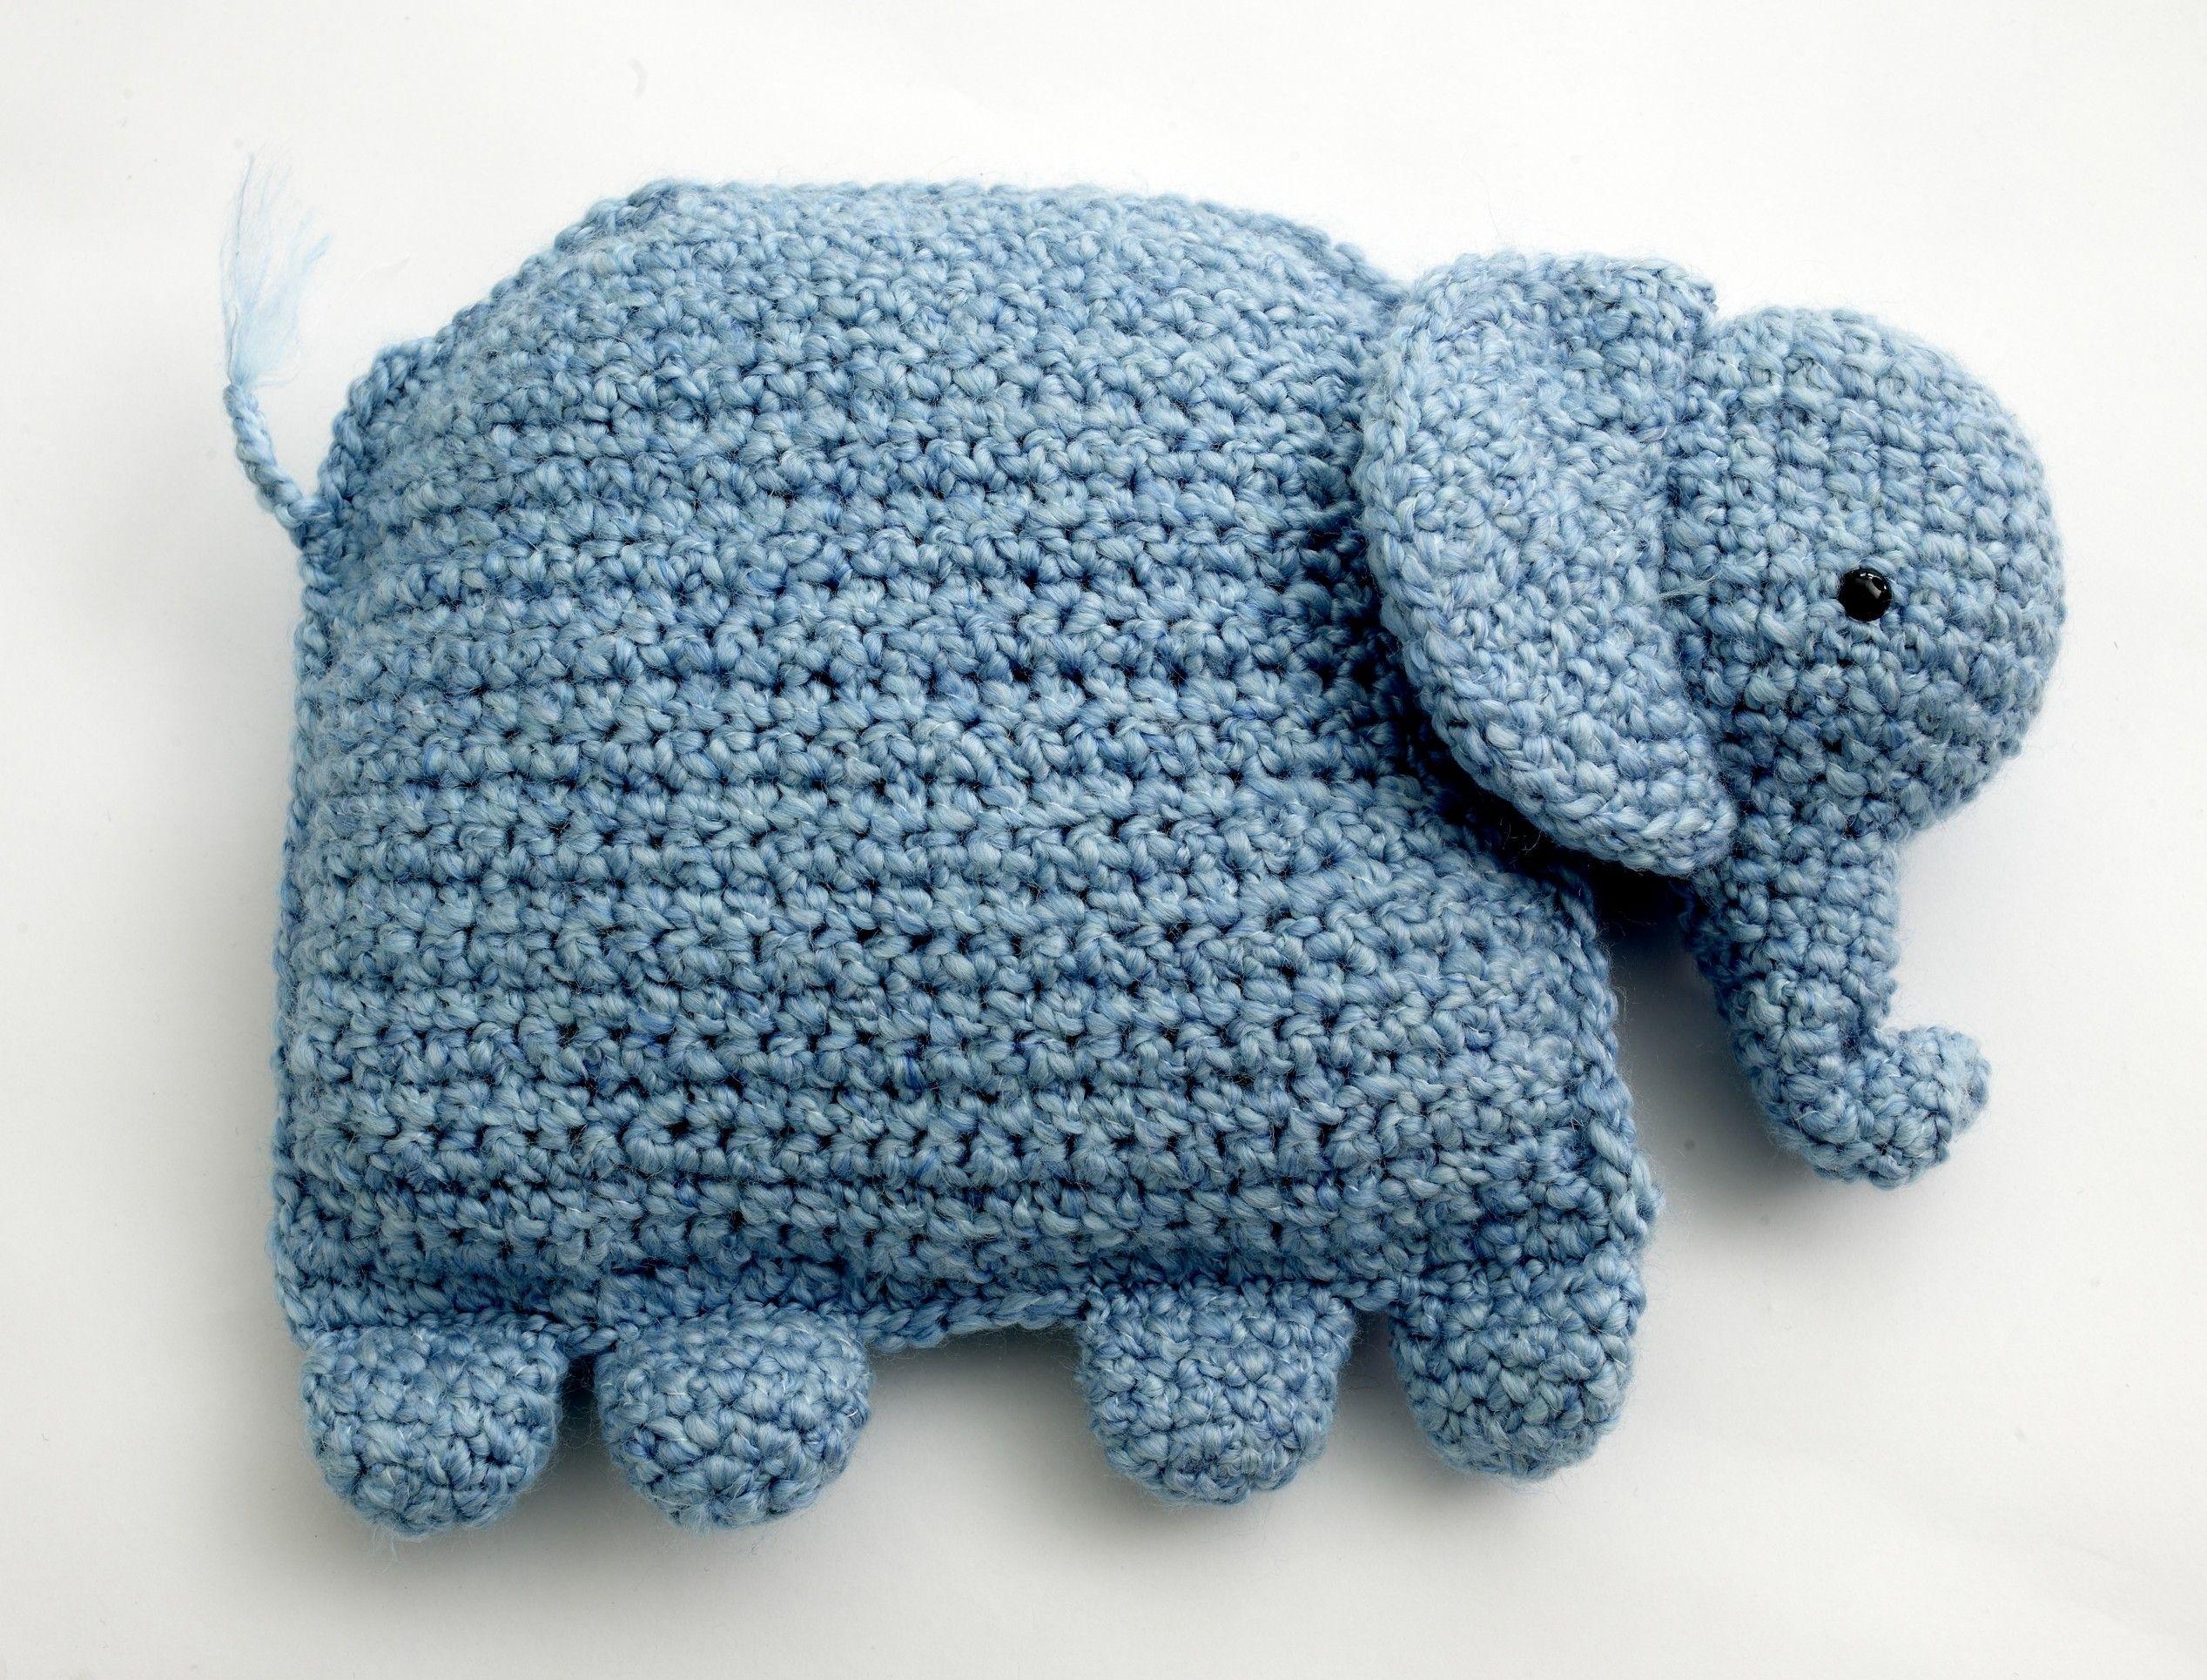 Amigurumi Patterns Elephant : Amigurumi archives cool creativities